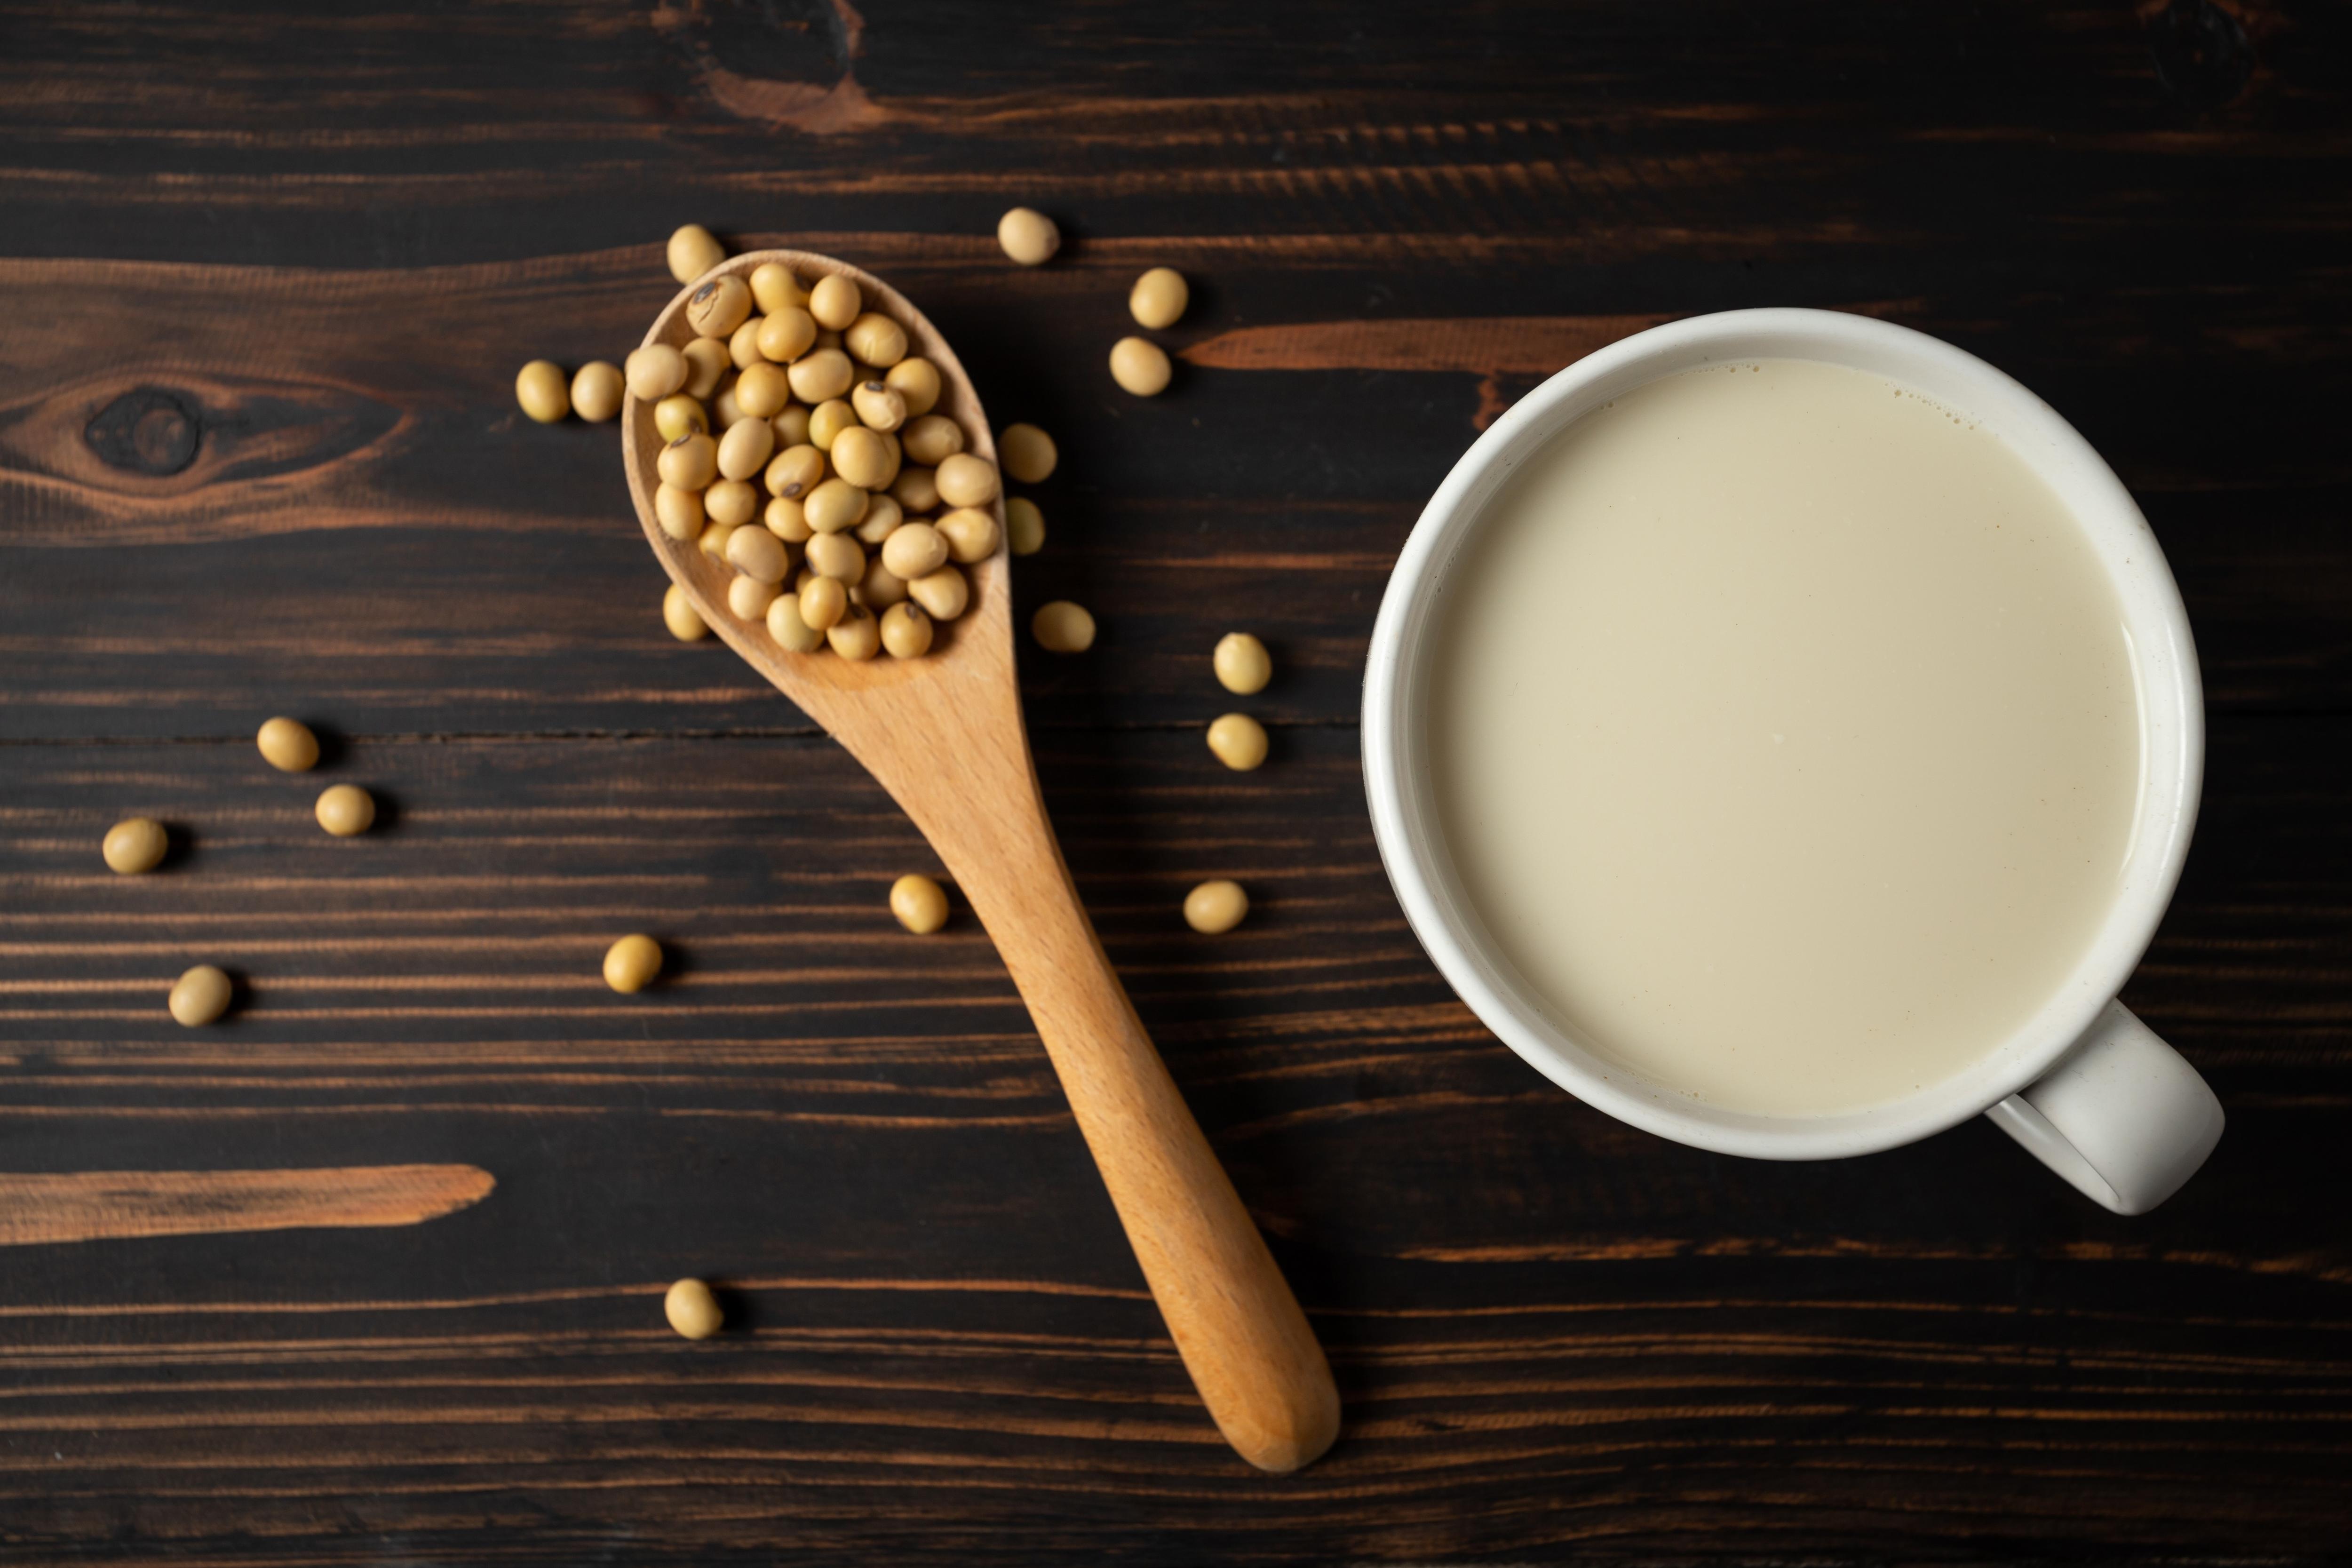 黃豆和豆漿